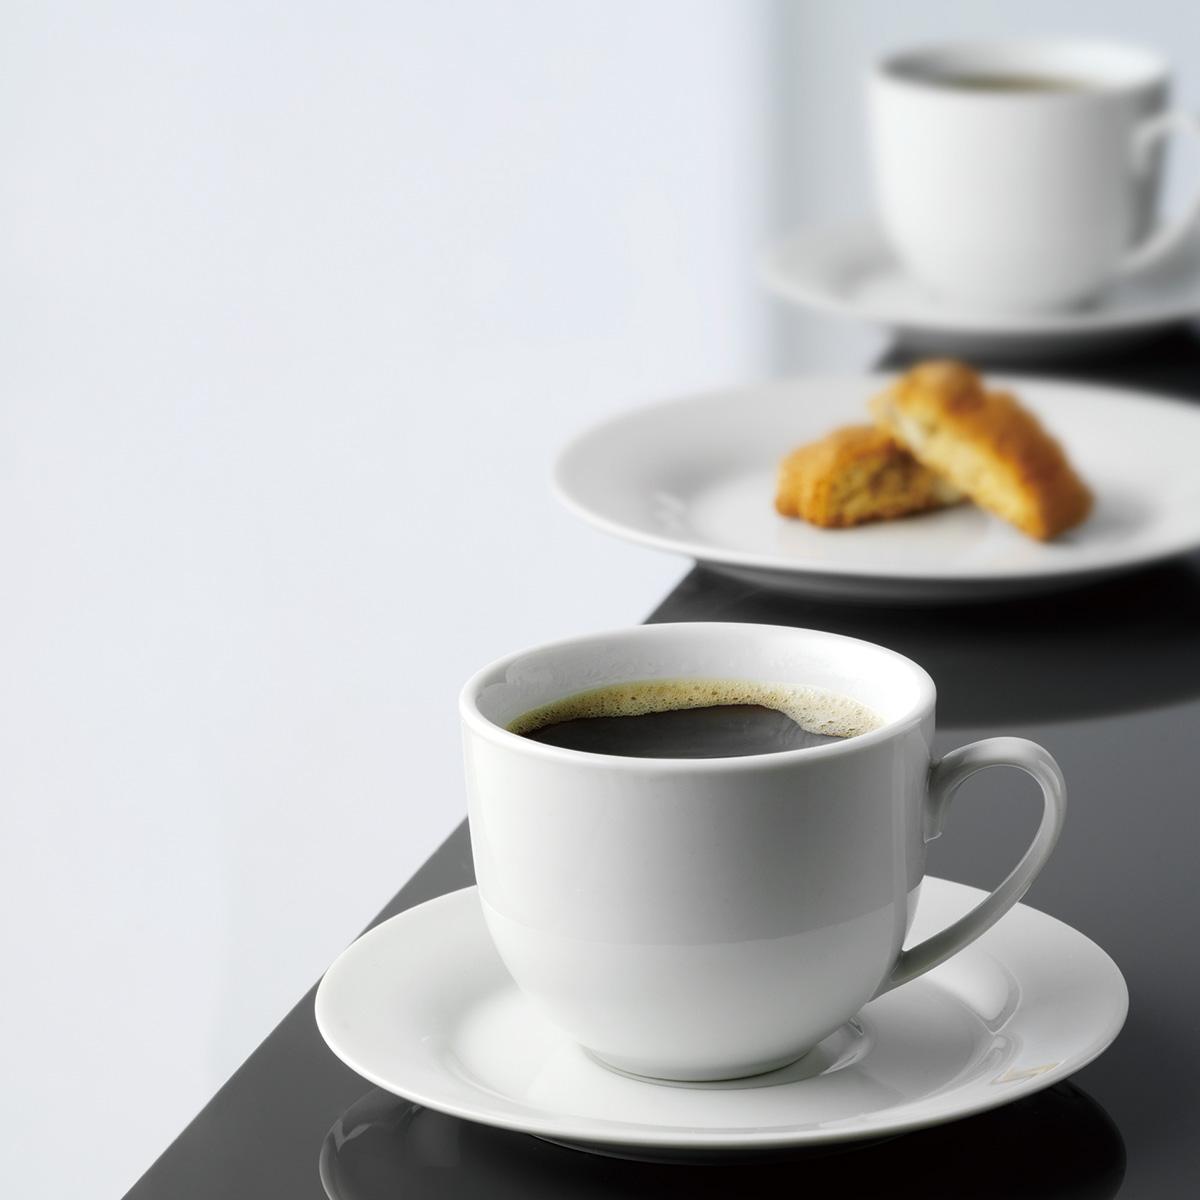 Usædvanlig aida stel - Café Porcelæn - 30 dele - Coop.dk GW58